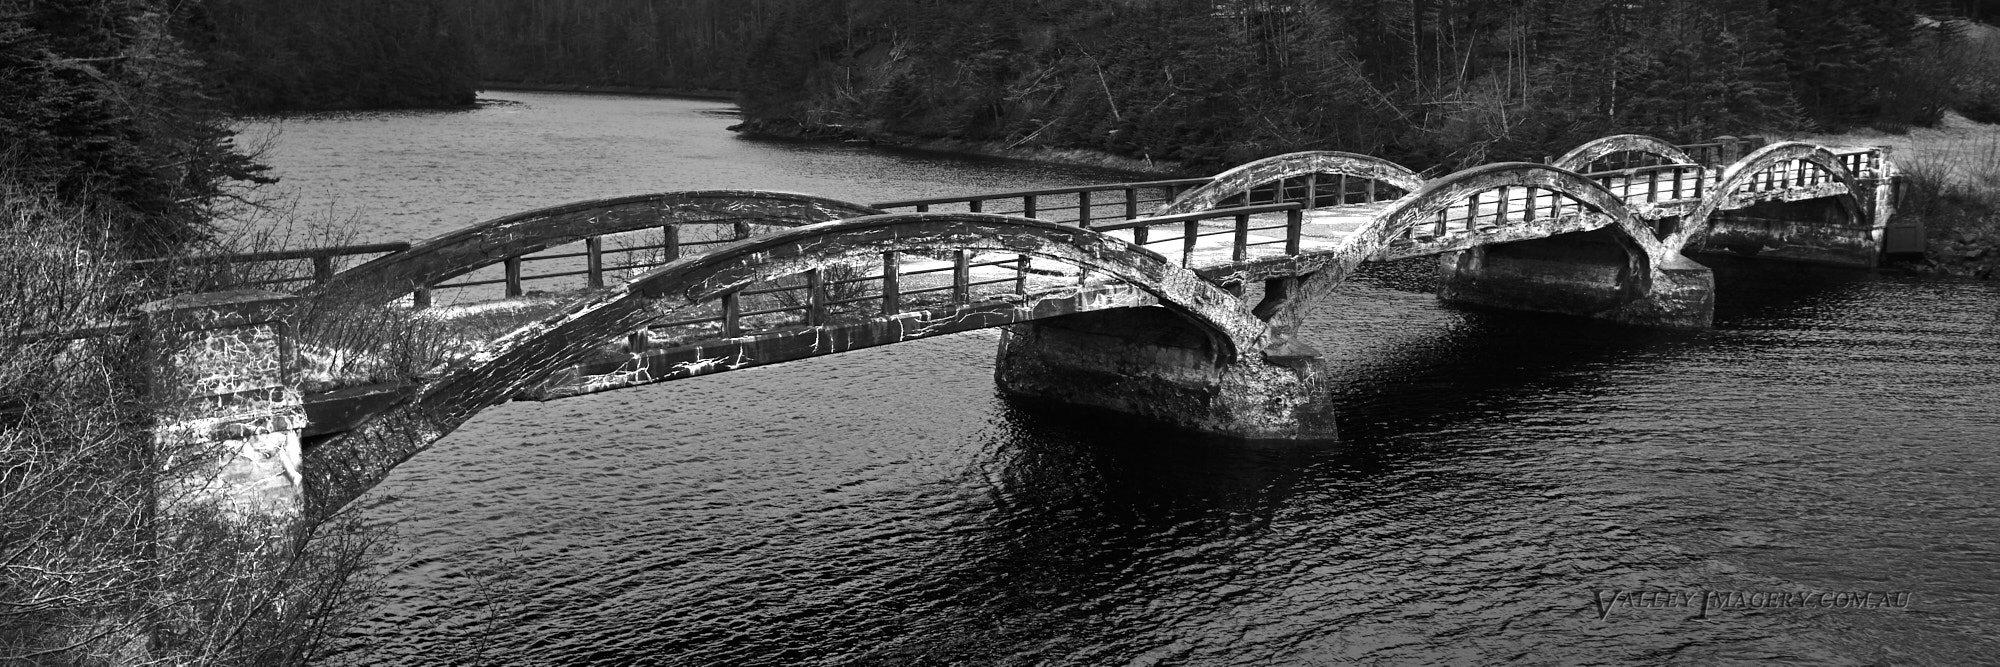 Derelict bridge, Newfoundland, Canada